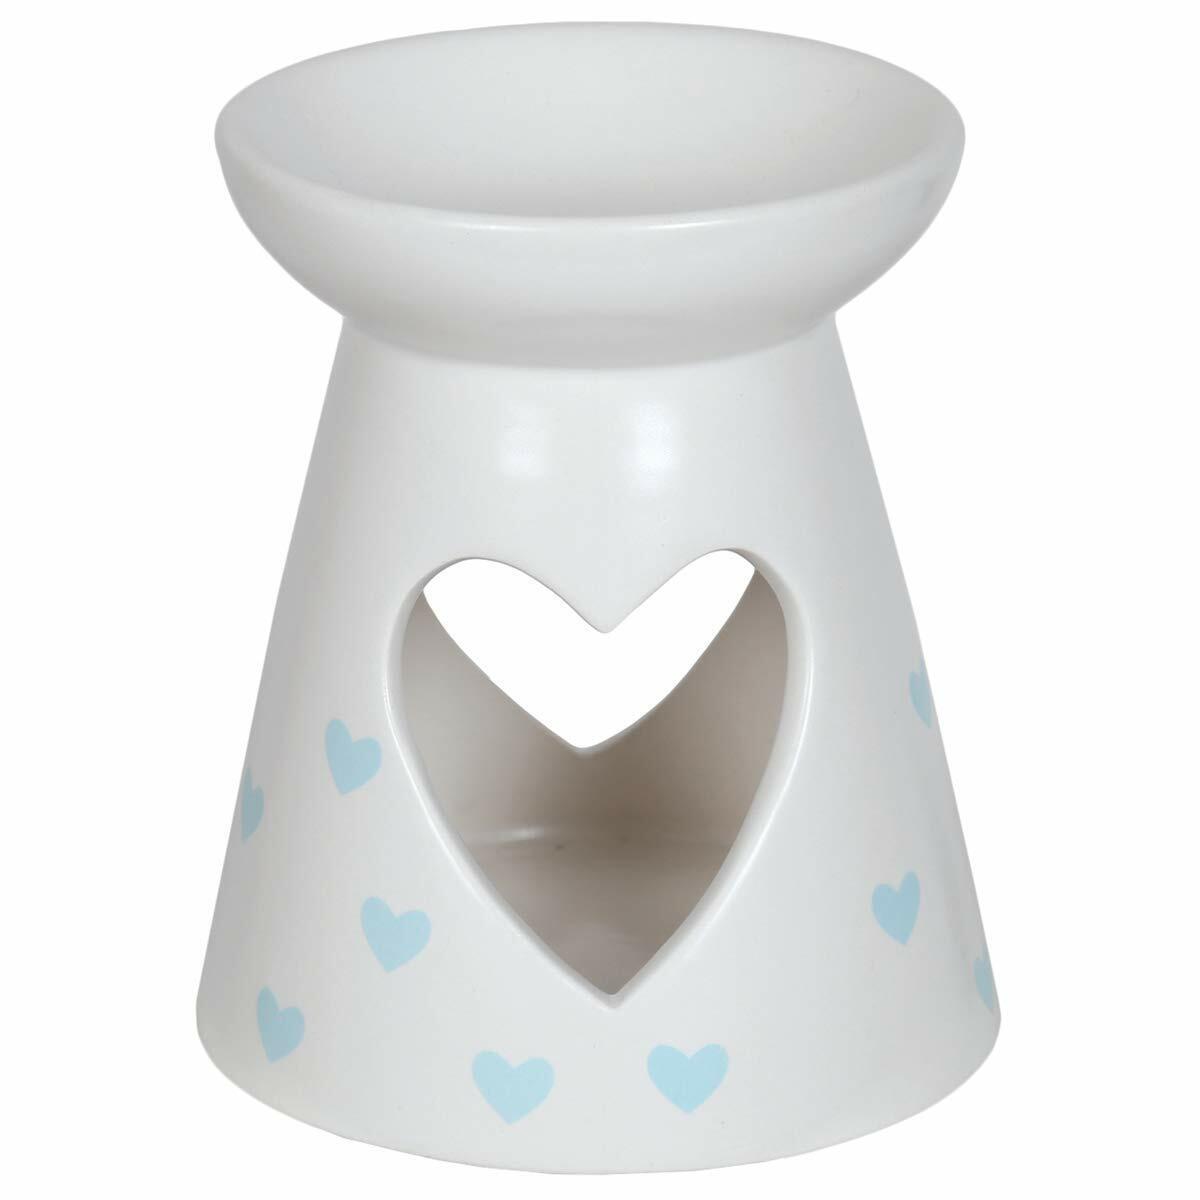 Aroma Accessories Blue Hearts Pattern Ceramic Wax Melt Burner 13cm high